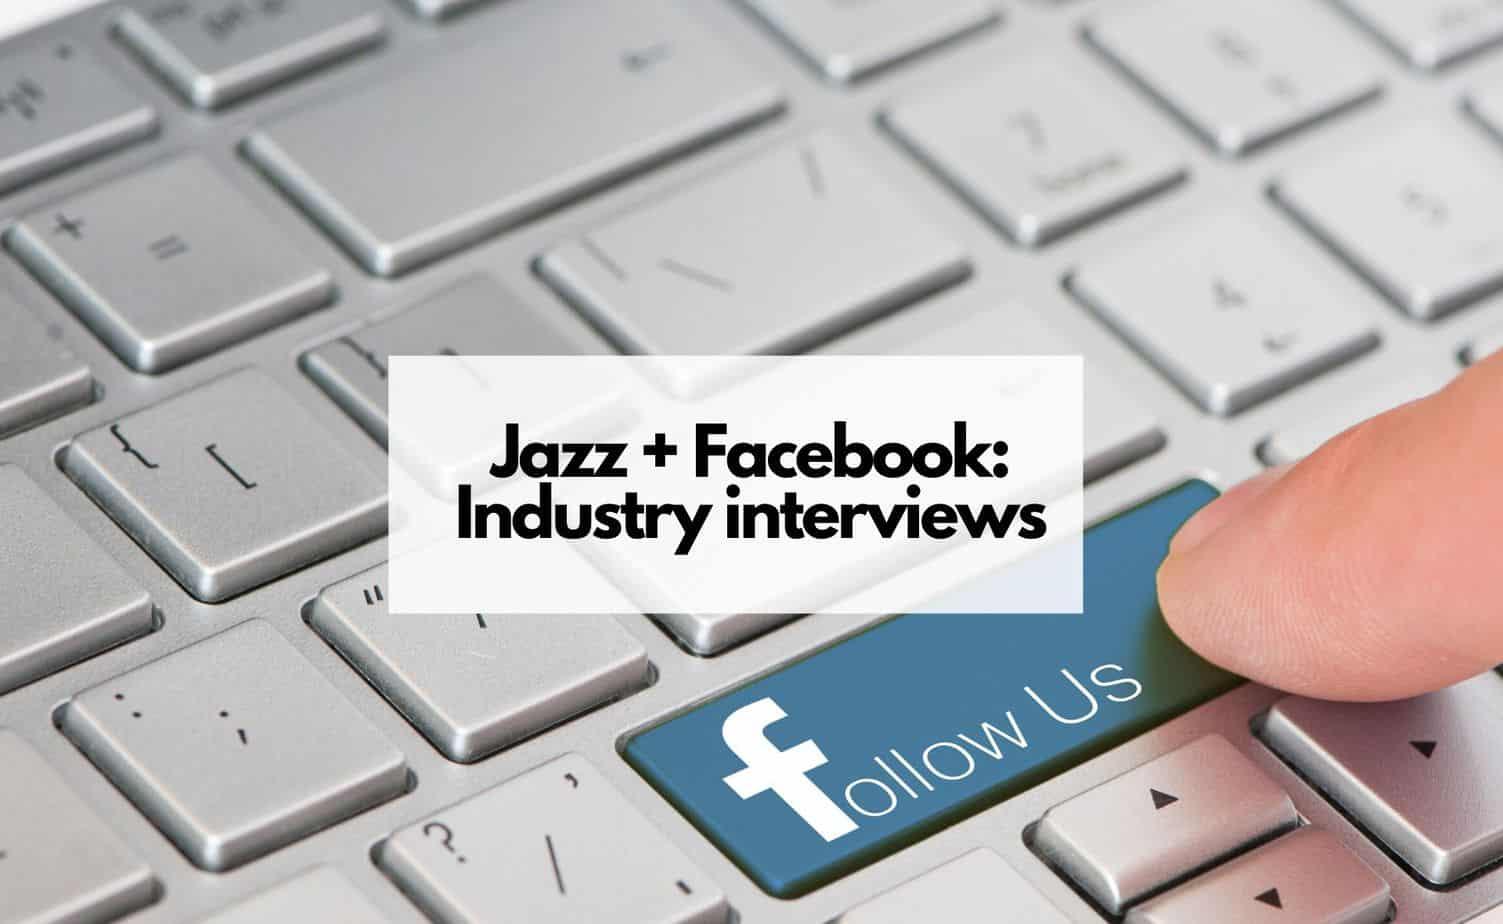 Jazz Industry Interviews: Talking Facebook